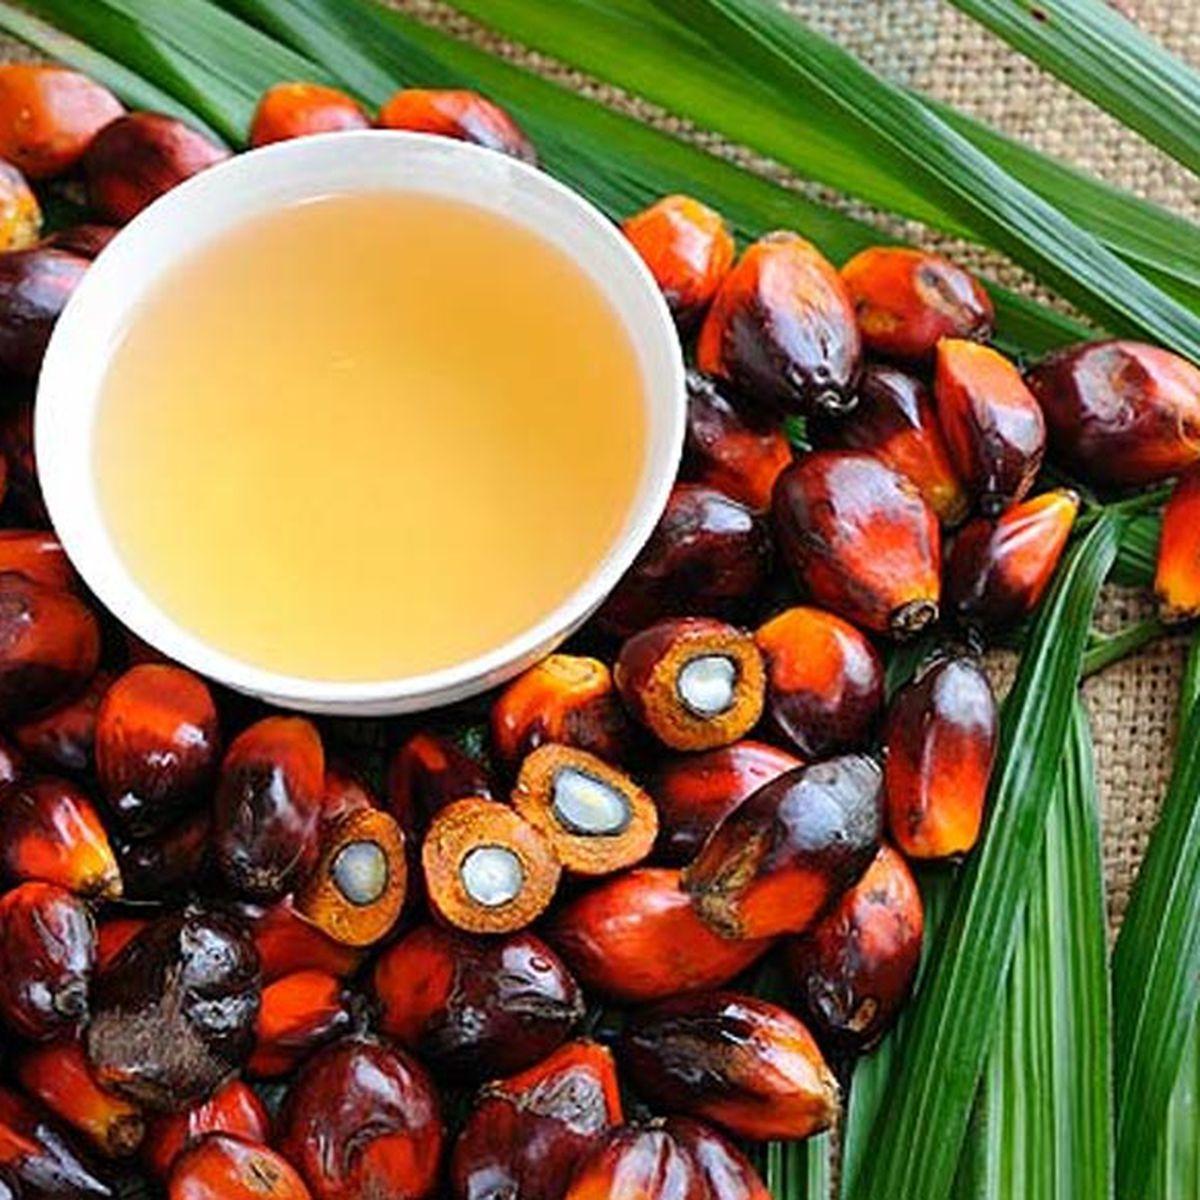 aceite de palma precio por tonelada